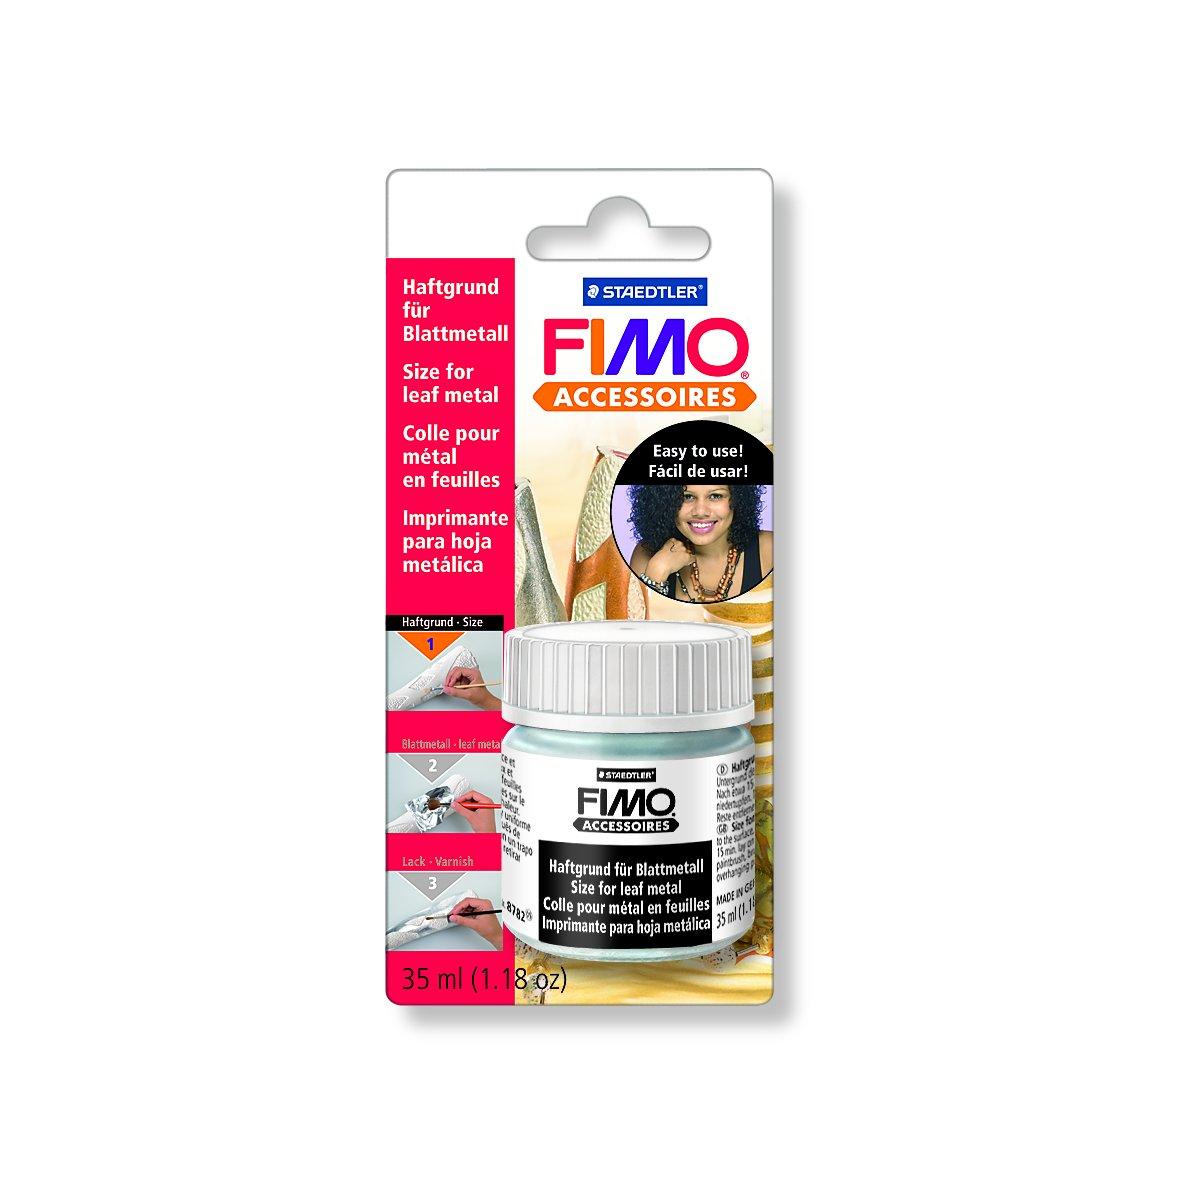 Fimo Tie Coat for Leaf Metal, 35ml, Adhesive, Grey, 6.7 x 4.8 x 14 cm KNORR prandell Creative distributor 8782 BK ST